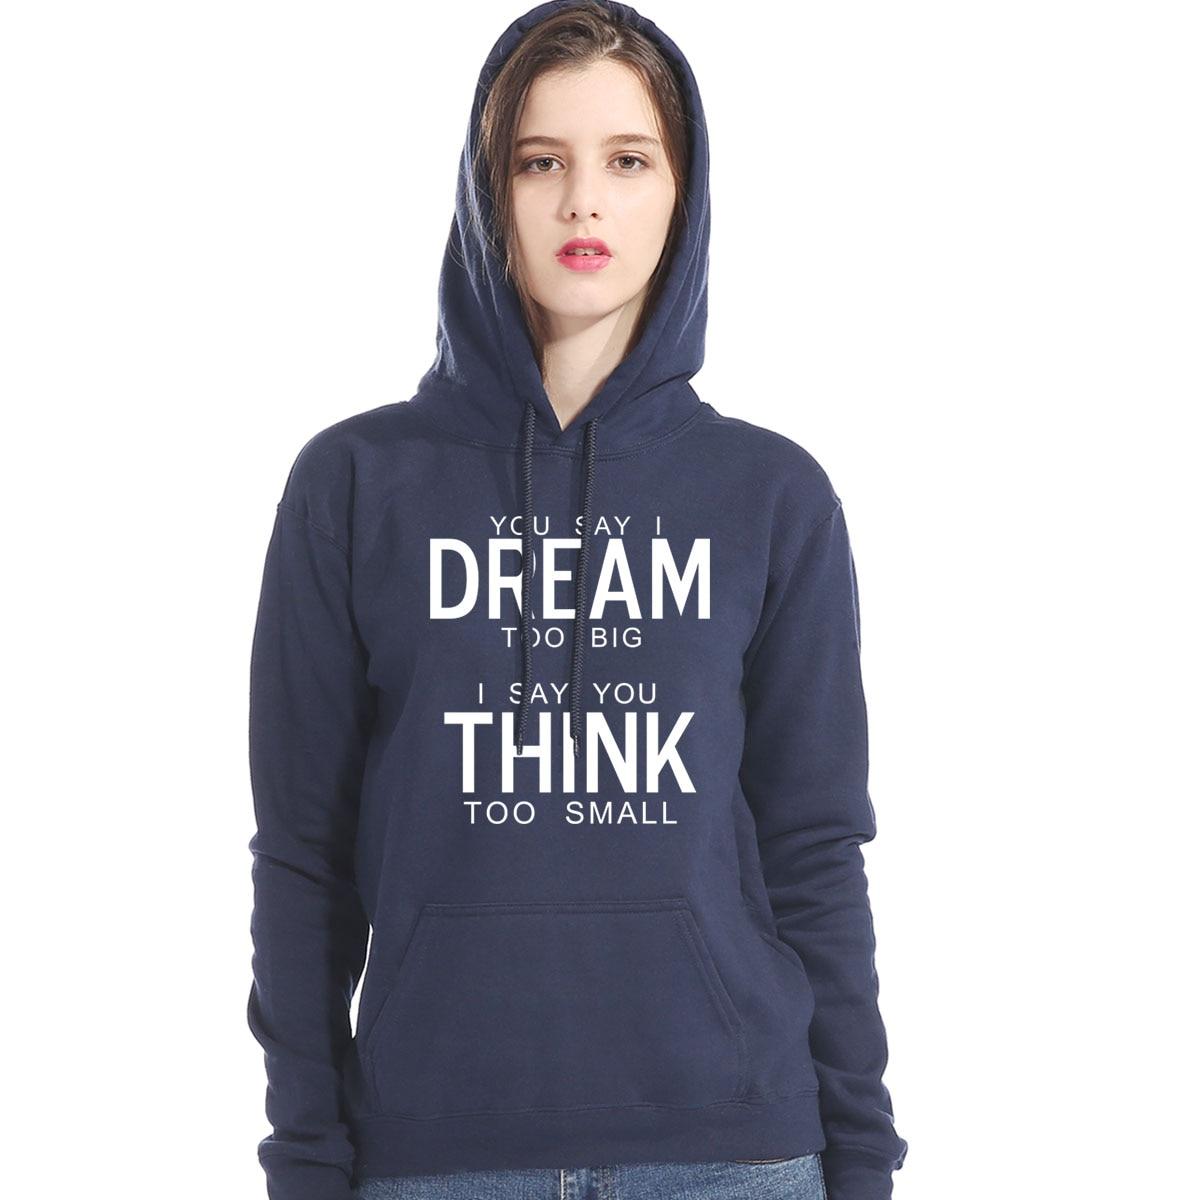 New Fashion Women Sweatshirt YOU SAY I DREAM TOO BIG I SAY YOU THINK TOO SMALL Print Winter Hoodies 2019 Fleece Female Tracksuit